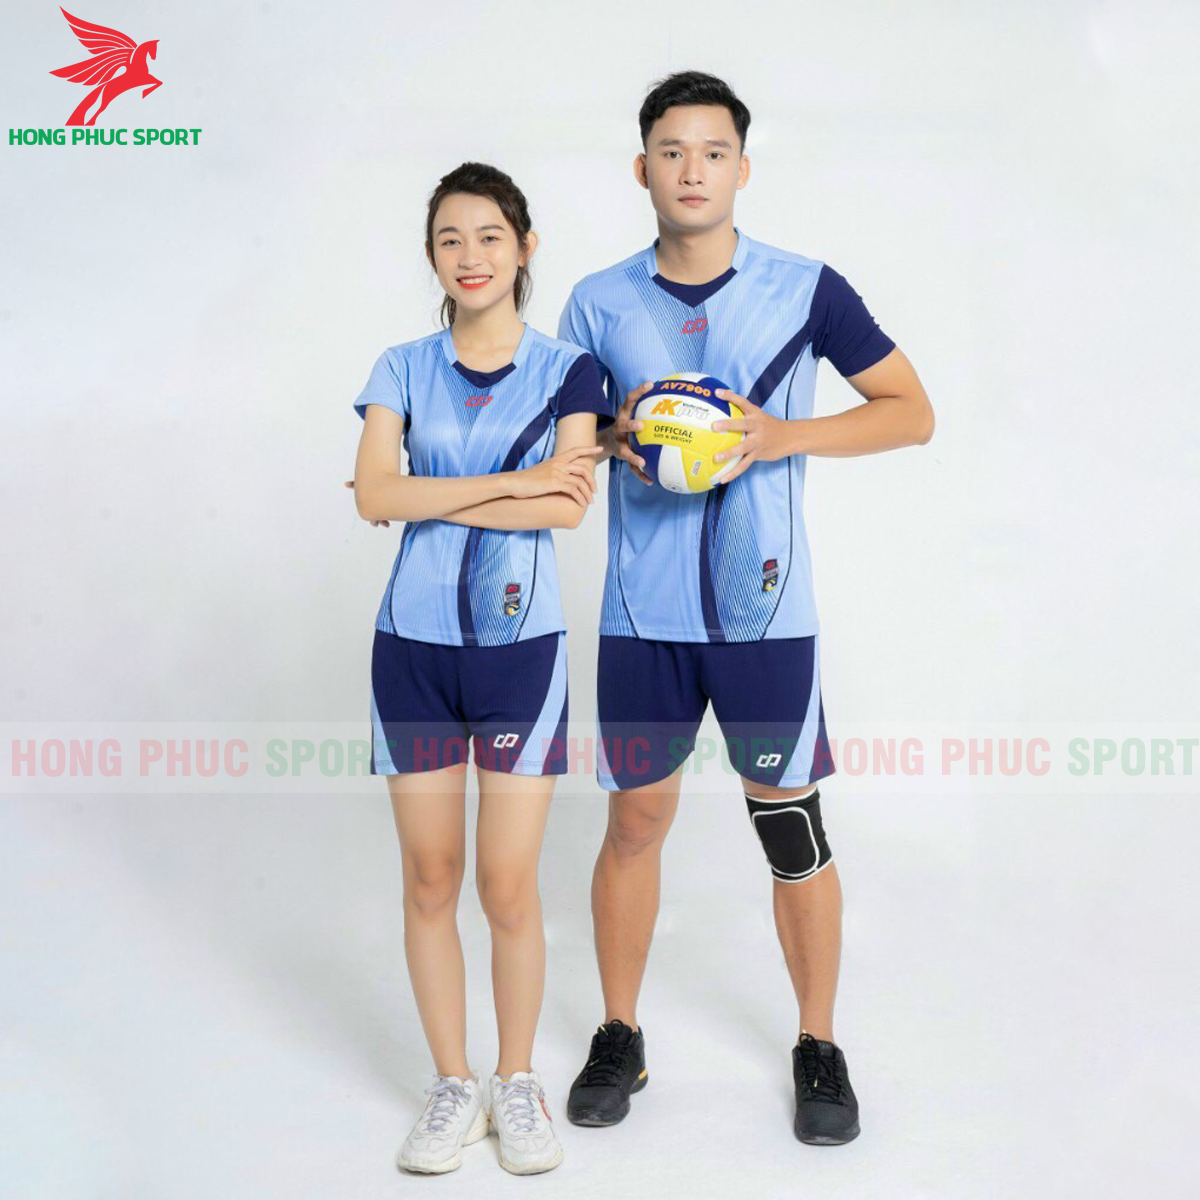 https://cdn.hongphucsport.com/unsafe/s4.shopbay.vn/files/285/quan-ao-bong-chuyen-zentiga-mau-xanh-bien-606d1834637a8.png